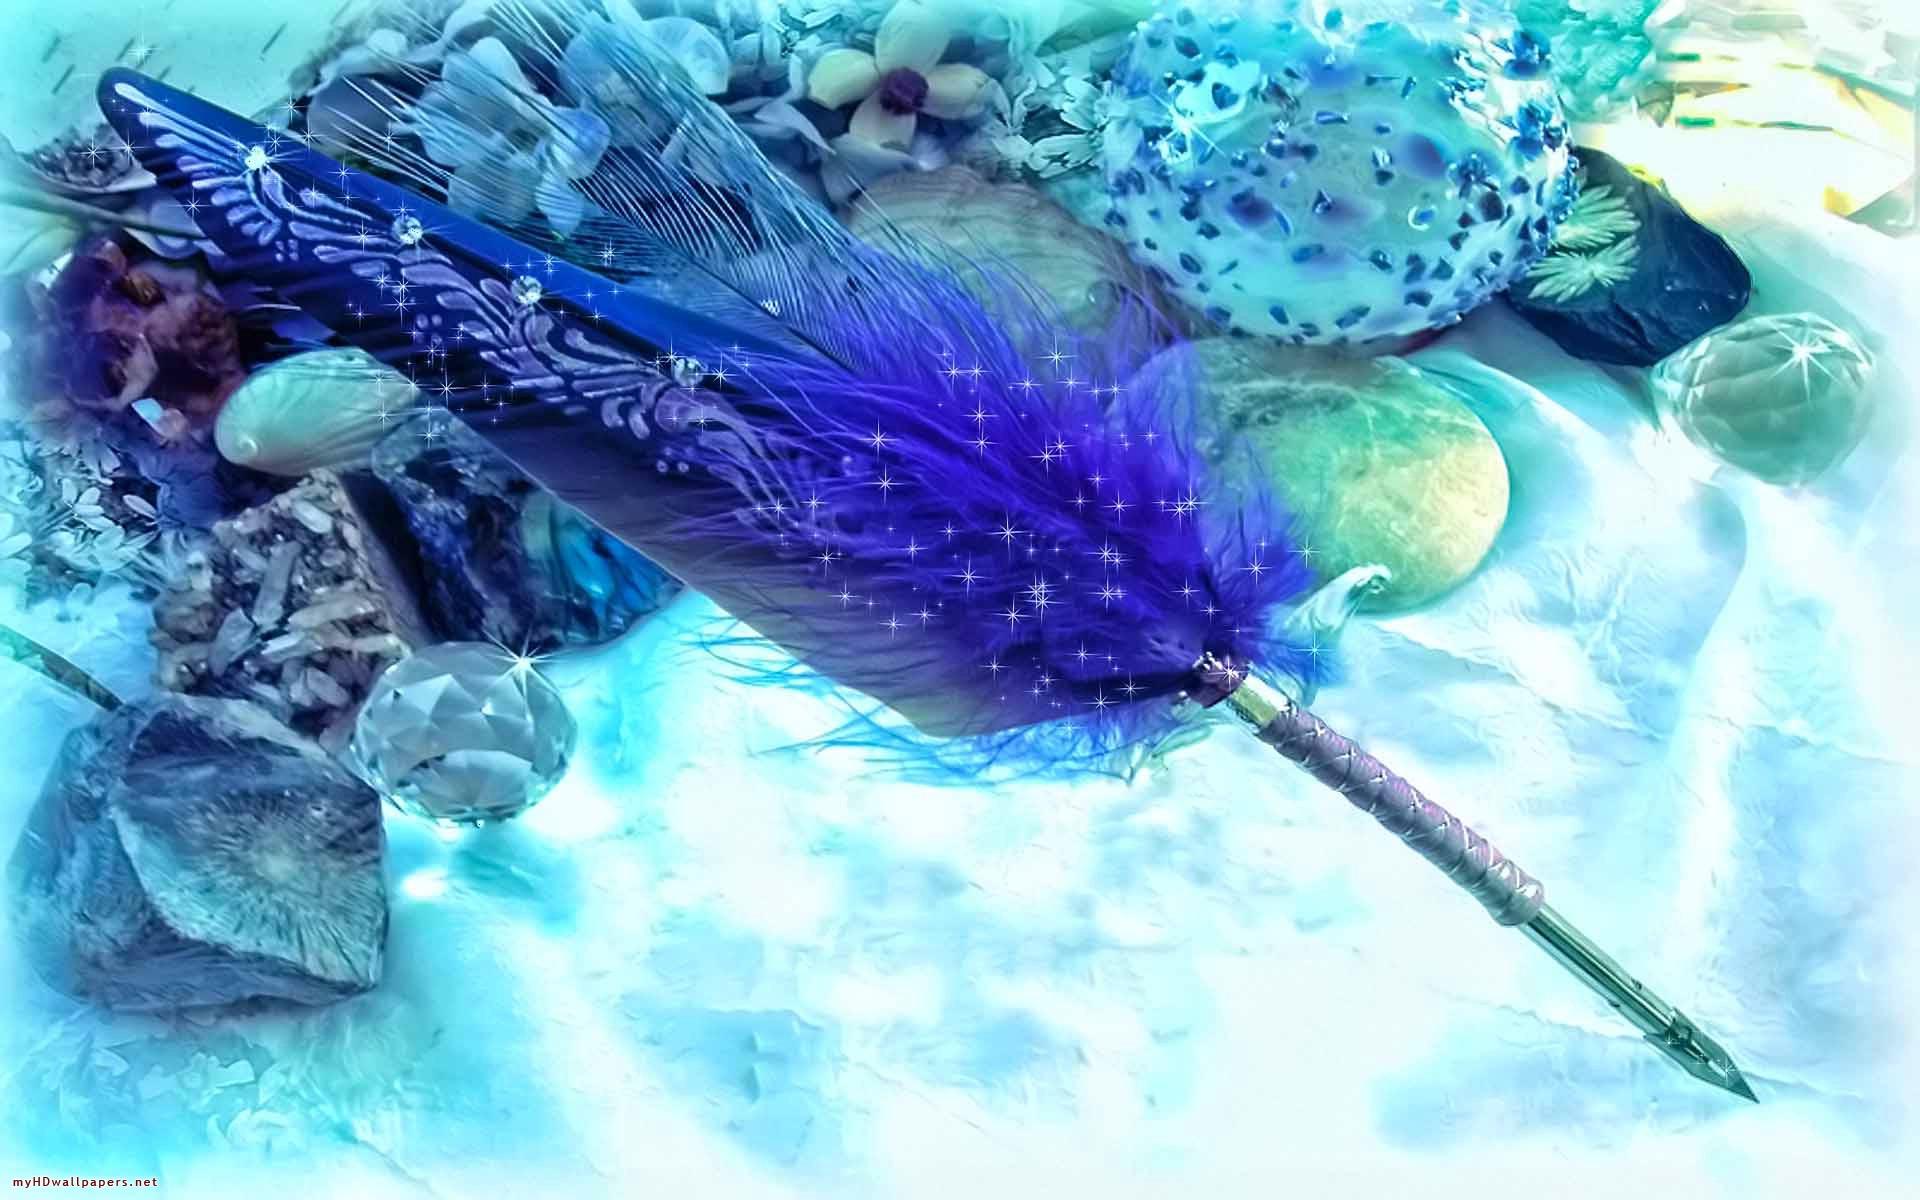 Peacock Feather Wallpaper For Desktop 697349   HD Wallpaper 1920x1200